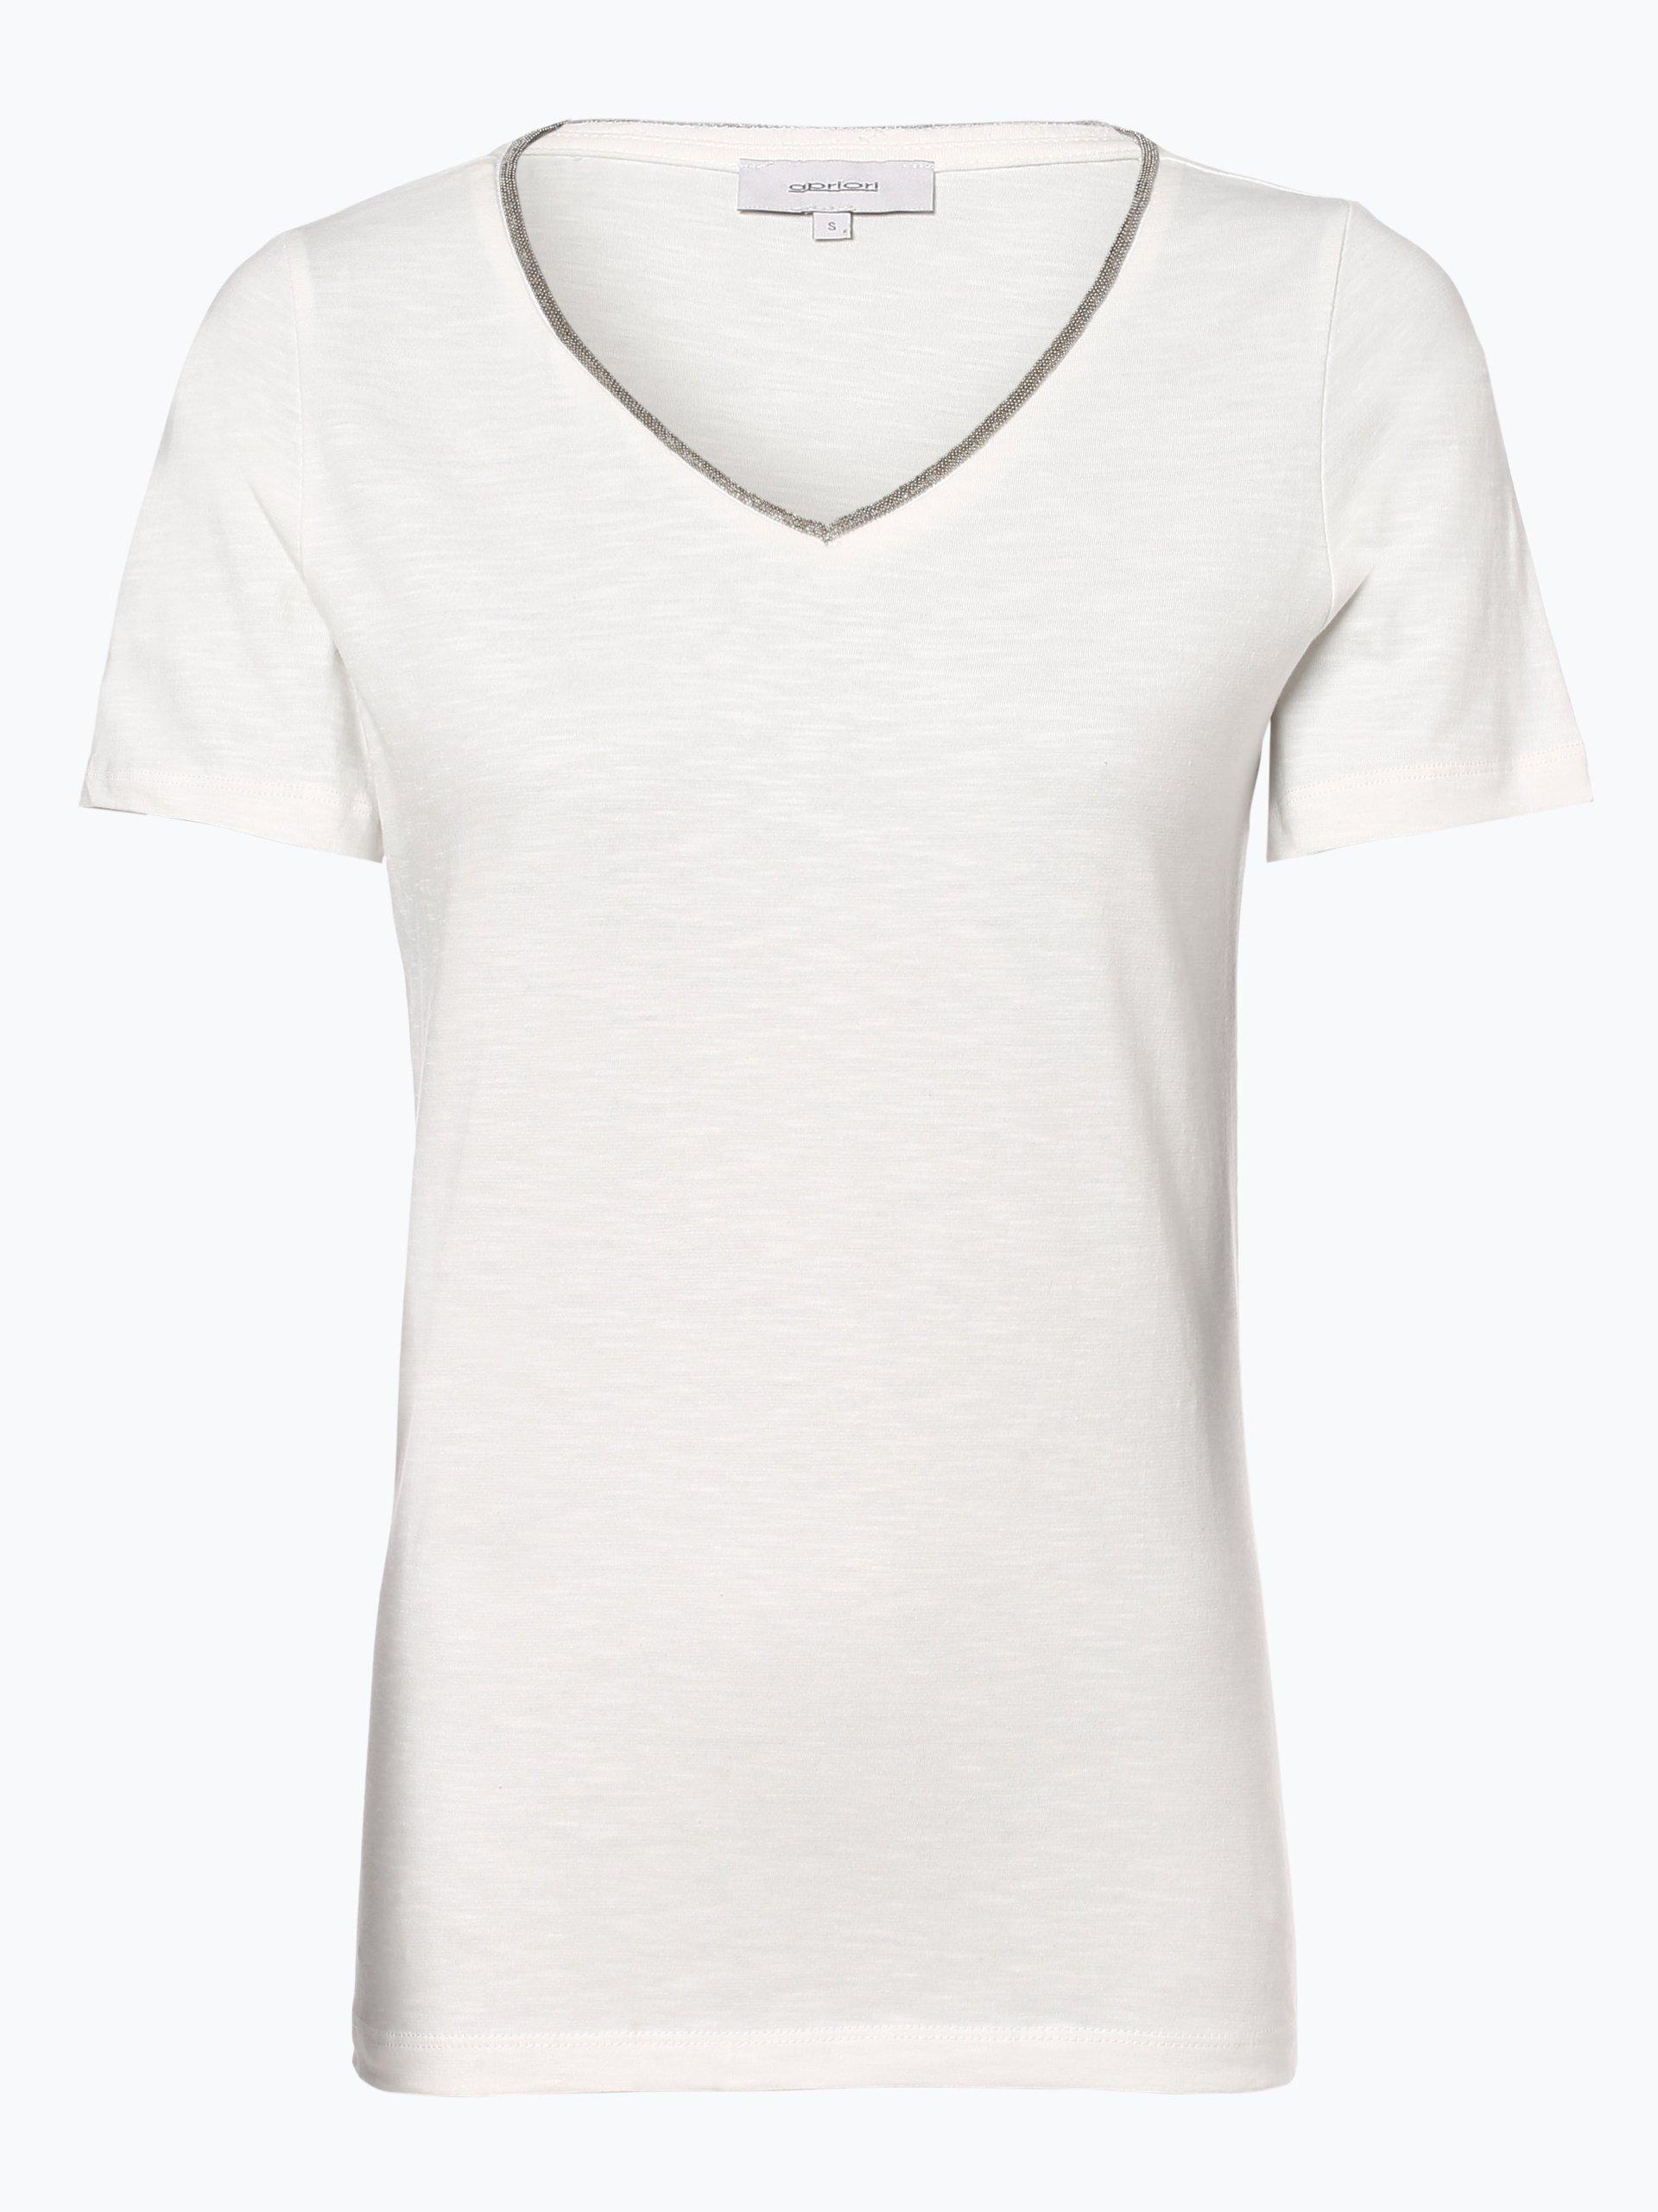 Apriori T-shirt damski – Coordinates